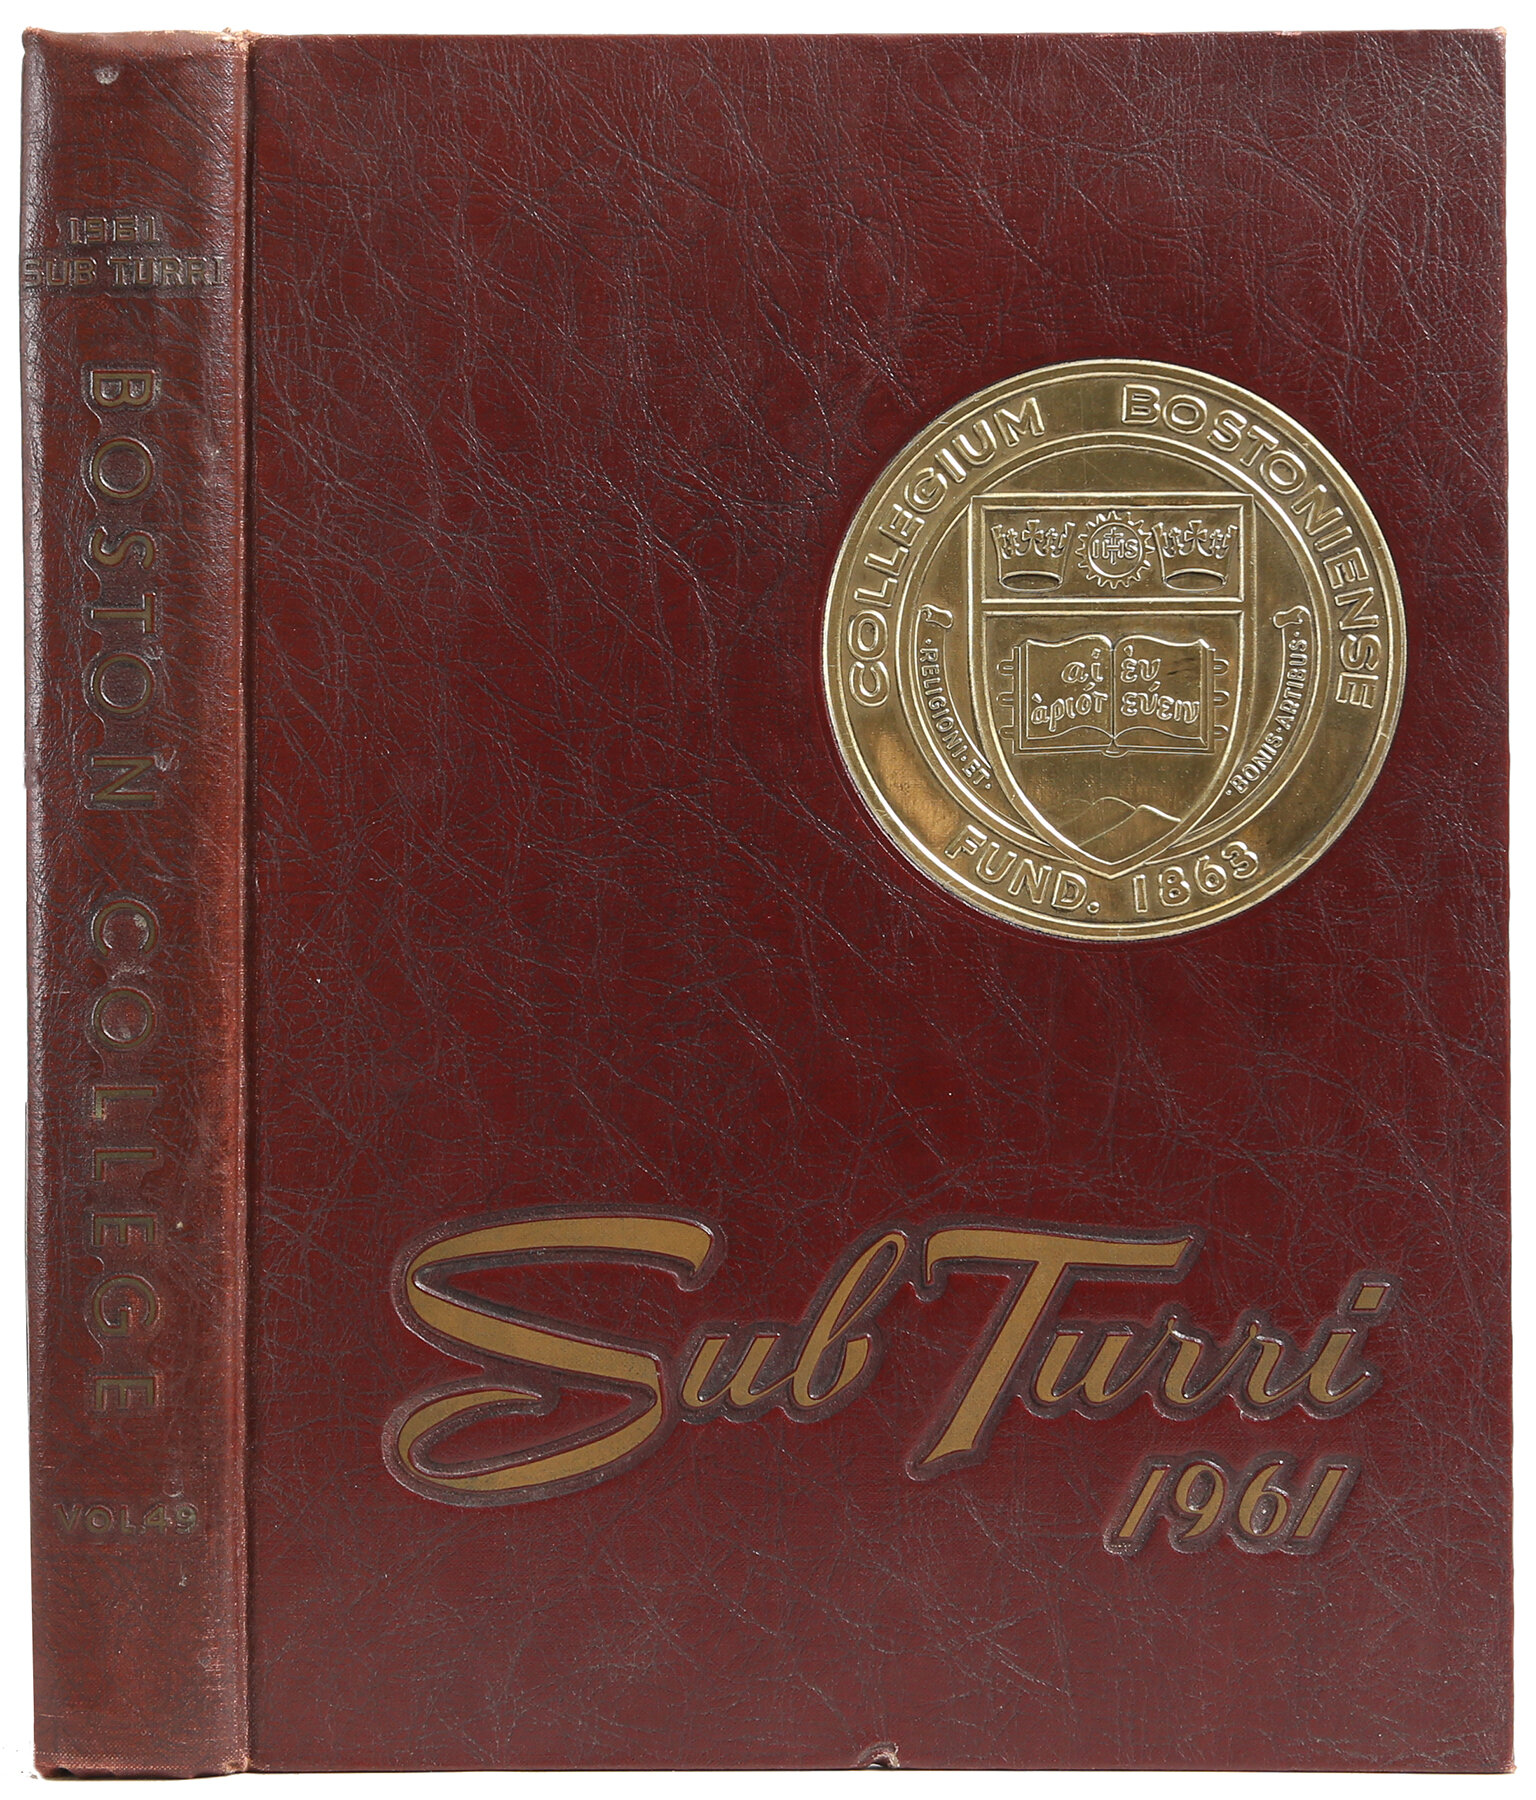 Booth Williams Sub Turri Of Boston College Yearbook 1961 Authentic Decorative Book Wayfair